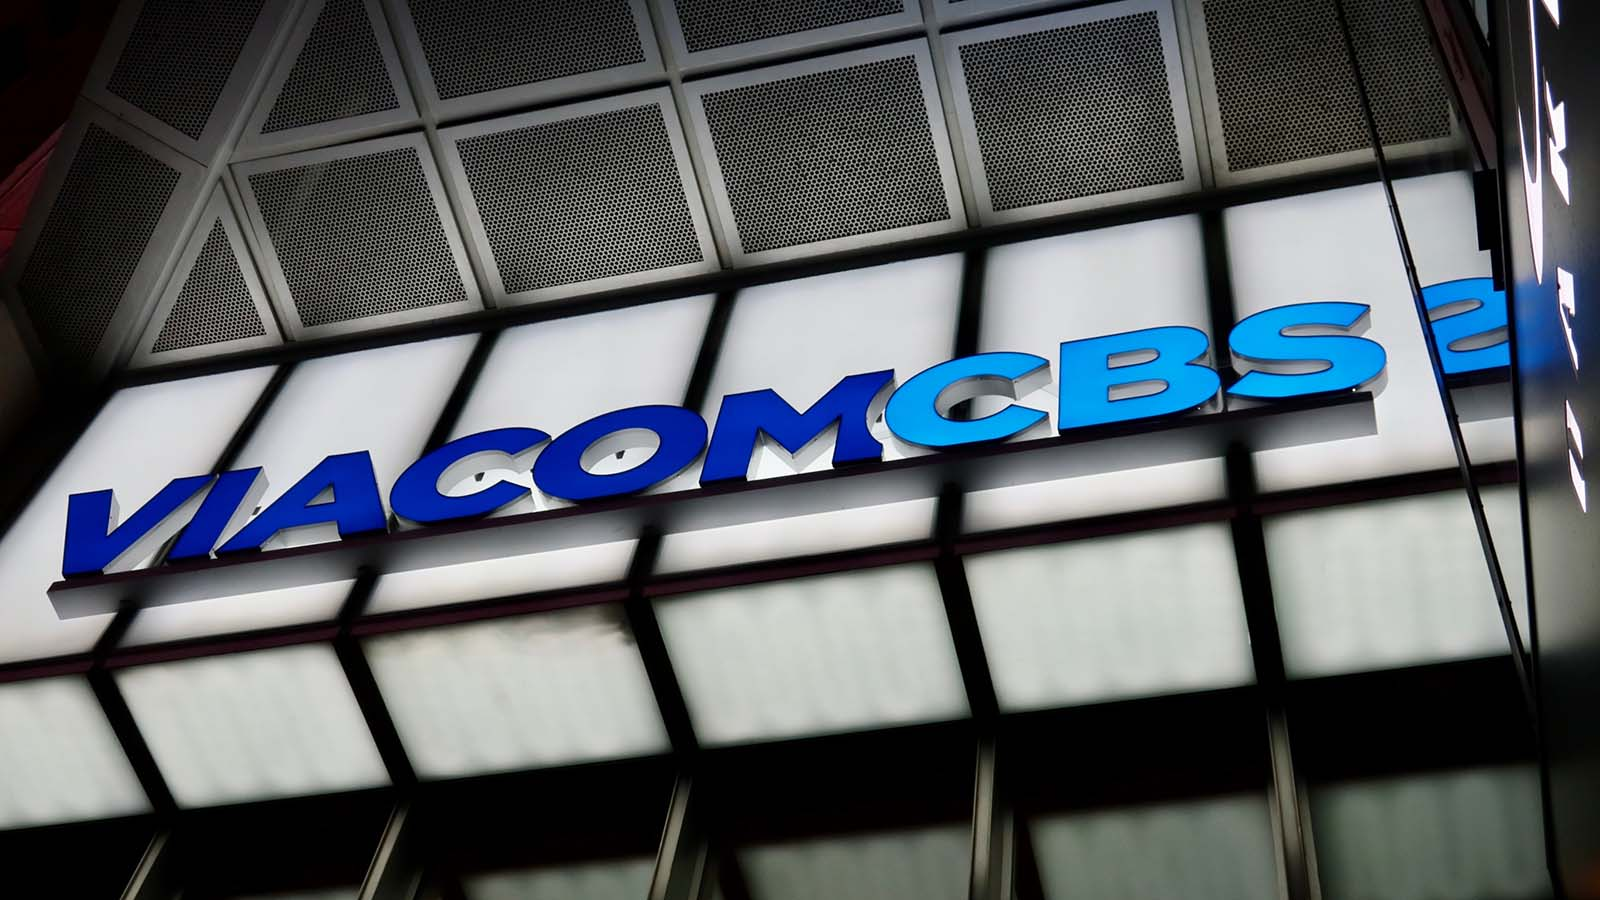 Capitalize on the Negative Overreaction Towards ViacomCBS